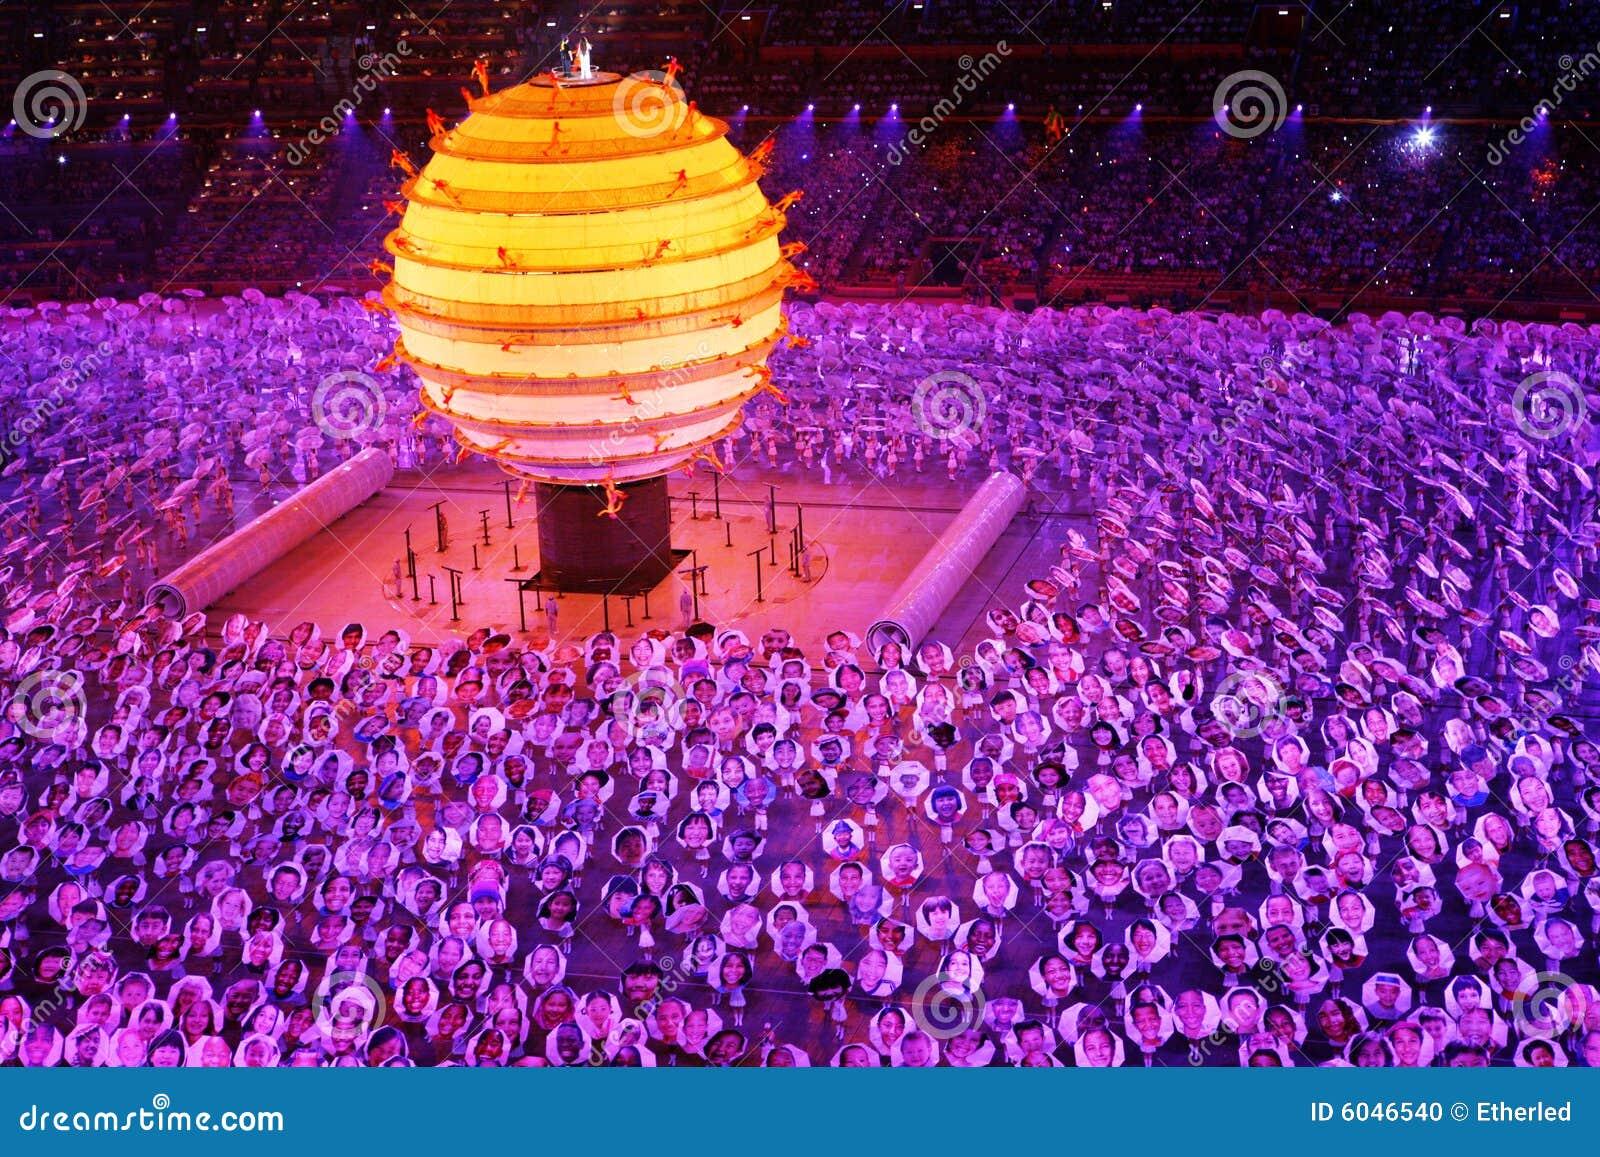 olympic-ceremony-6046540.jpg